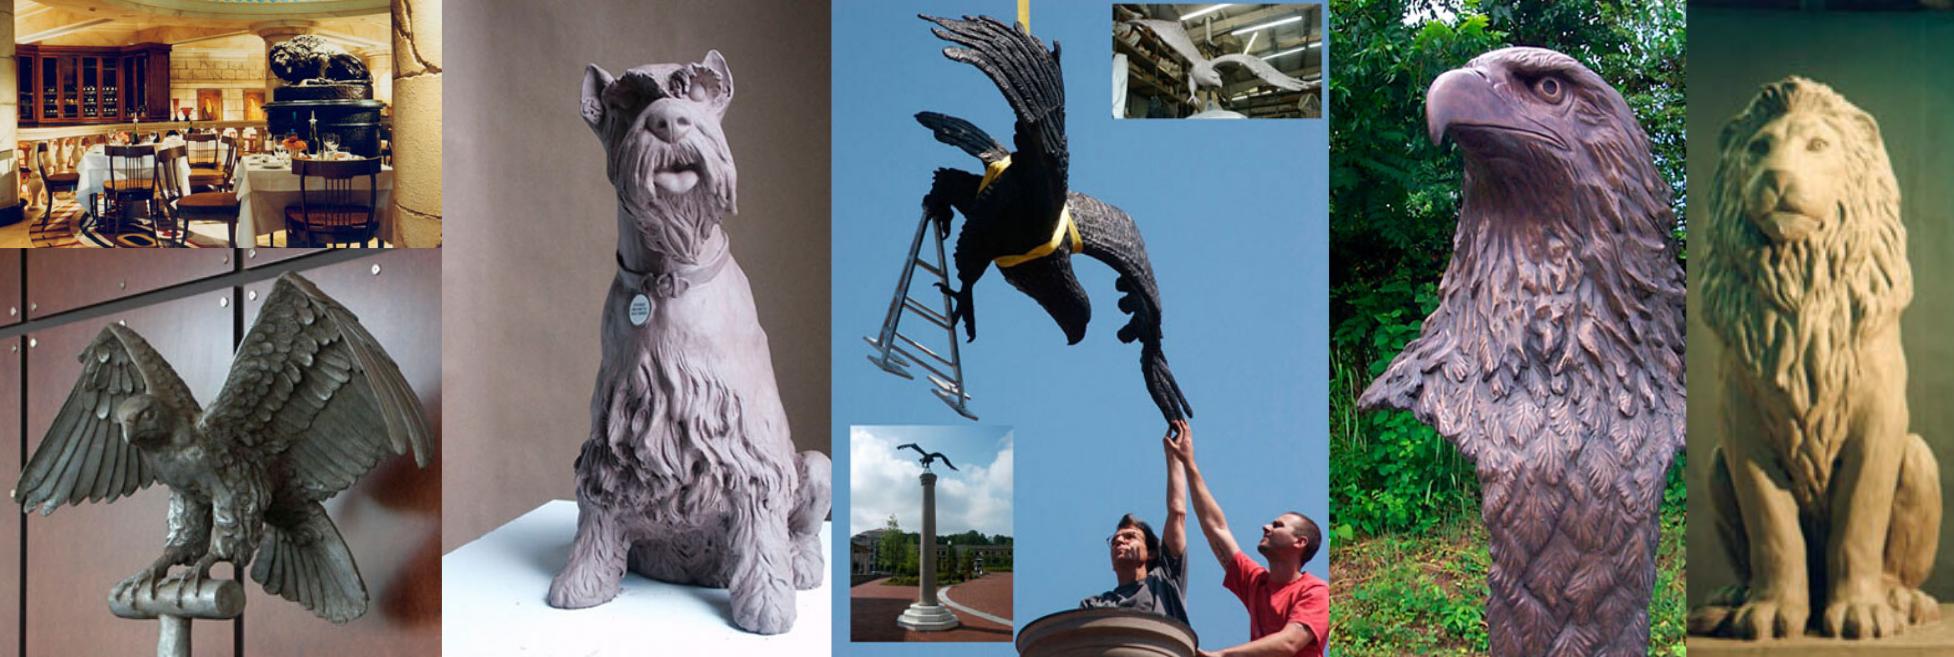 Wildlife Sculptures in Atlanta, GA